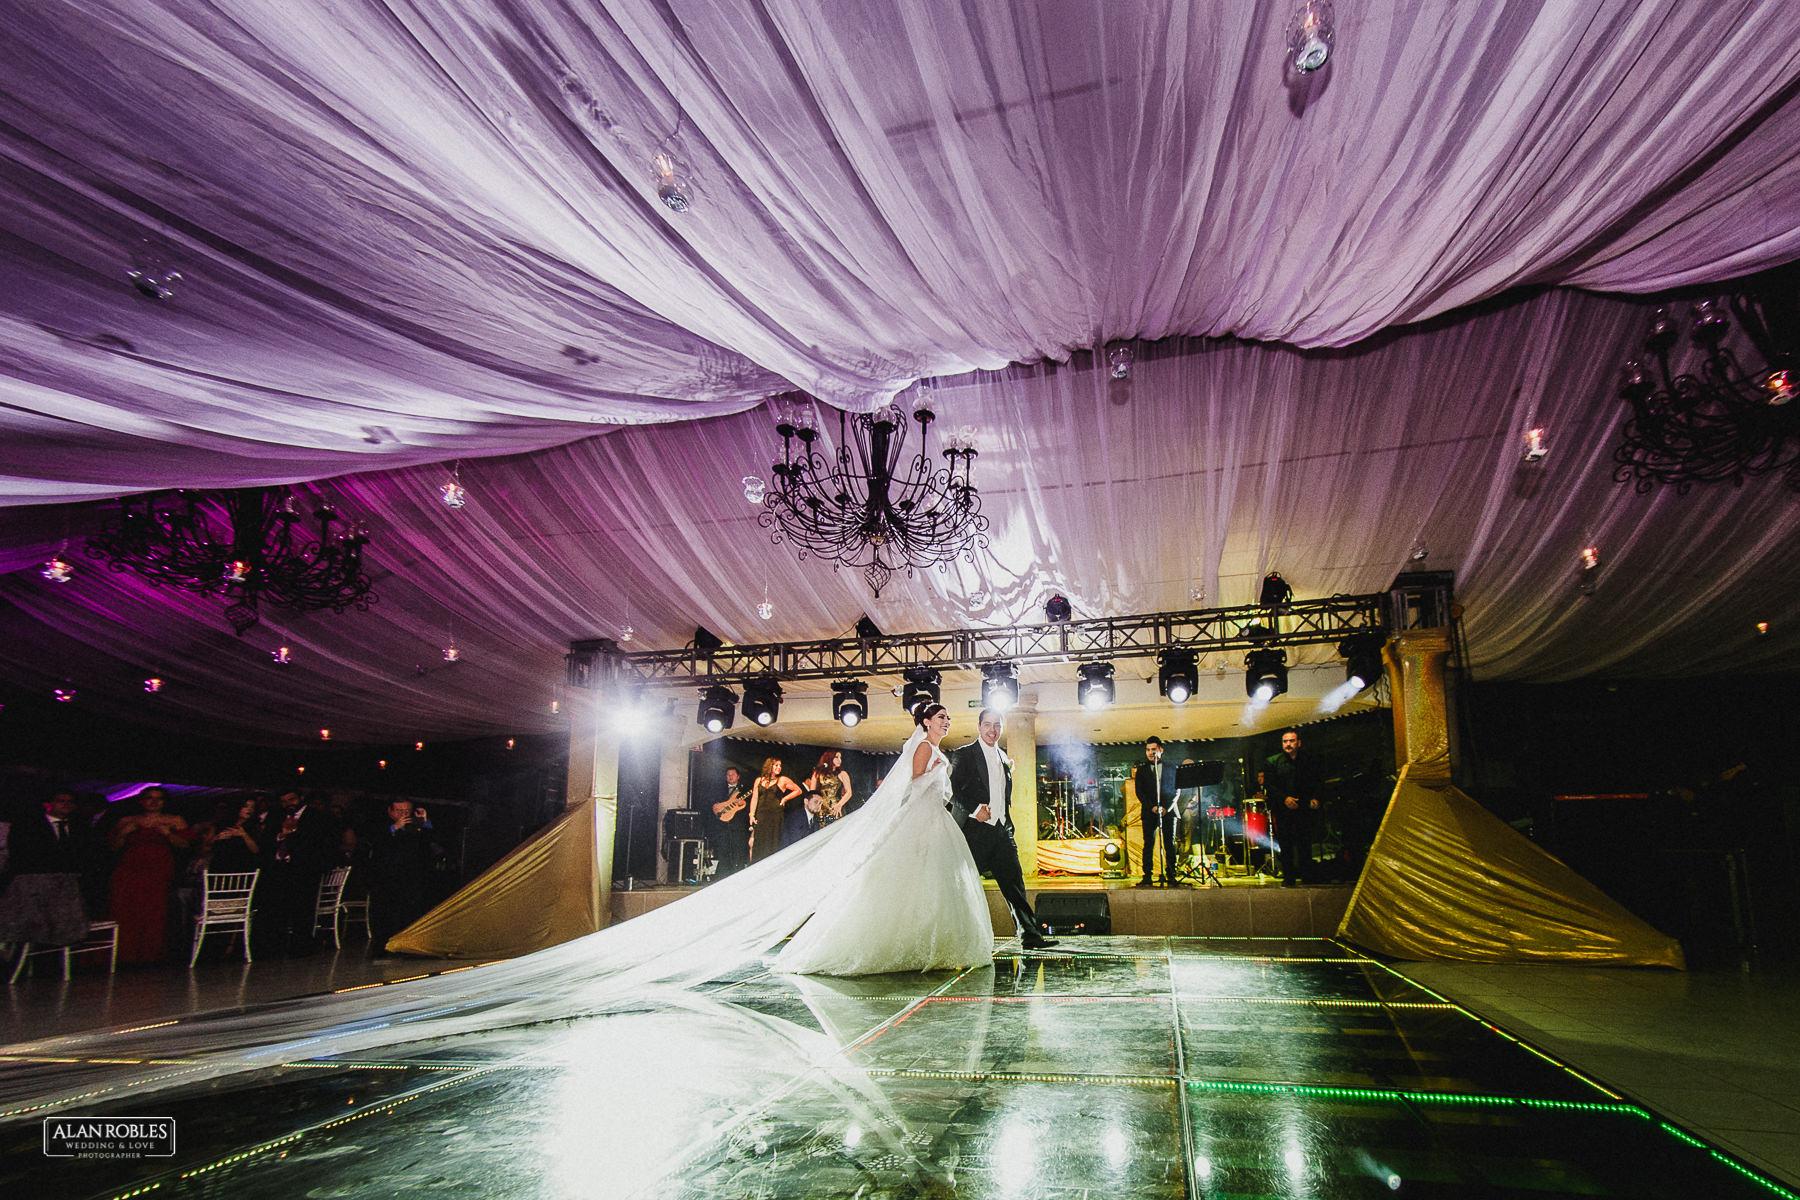 Alan Robles fotografo de bodas guadalajara - LyP Hotel Demetria-63